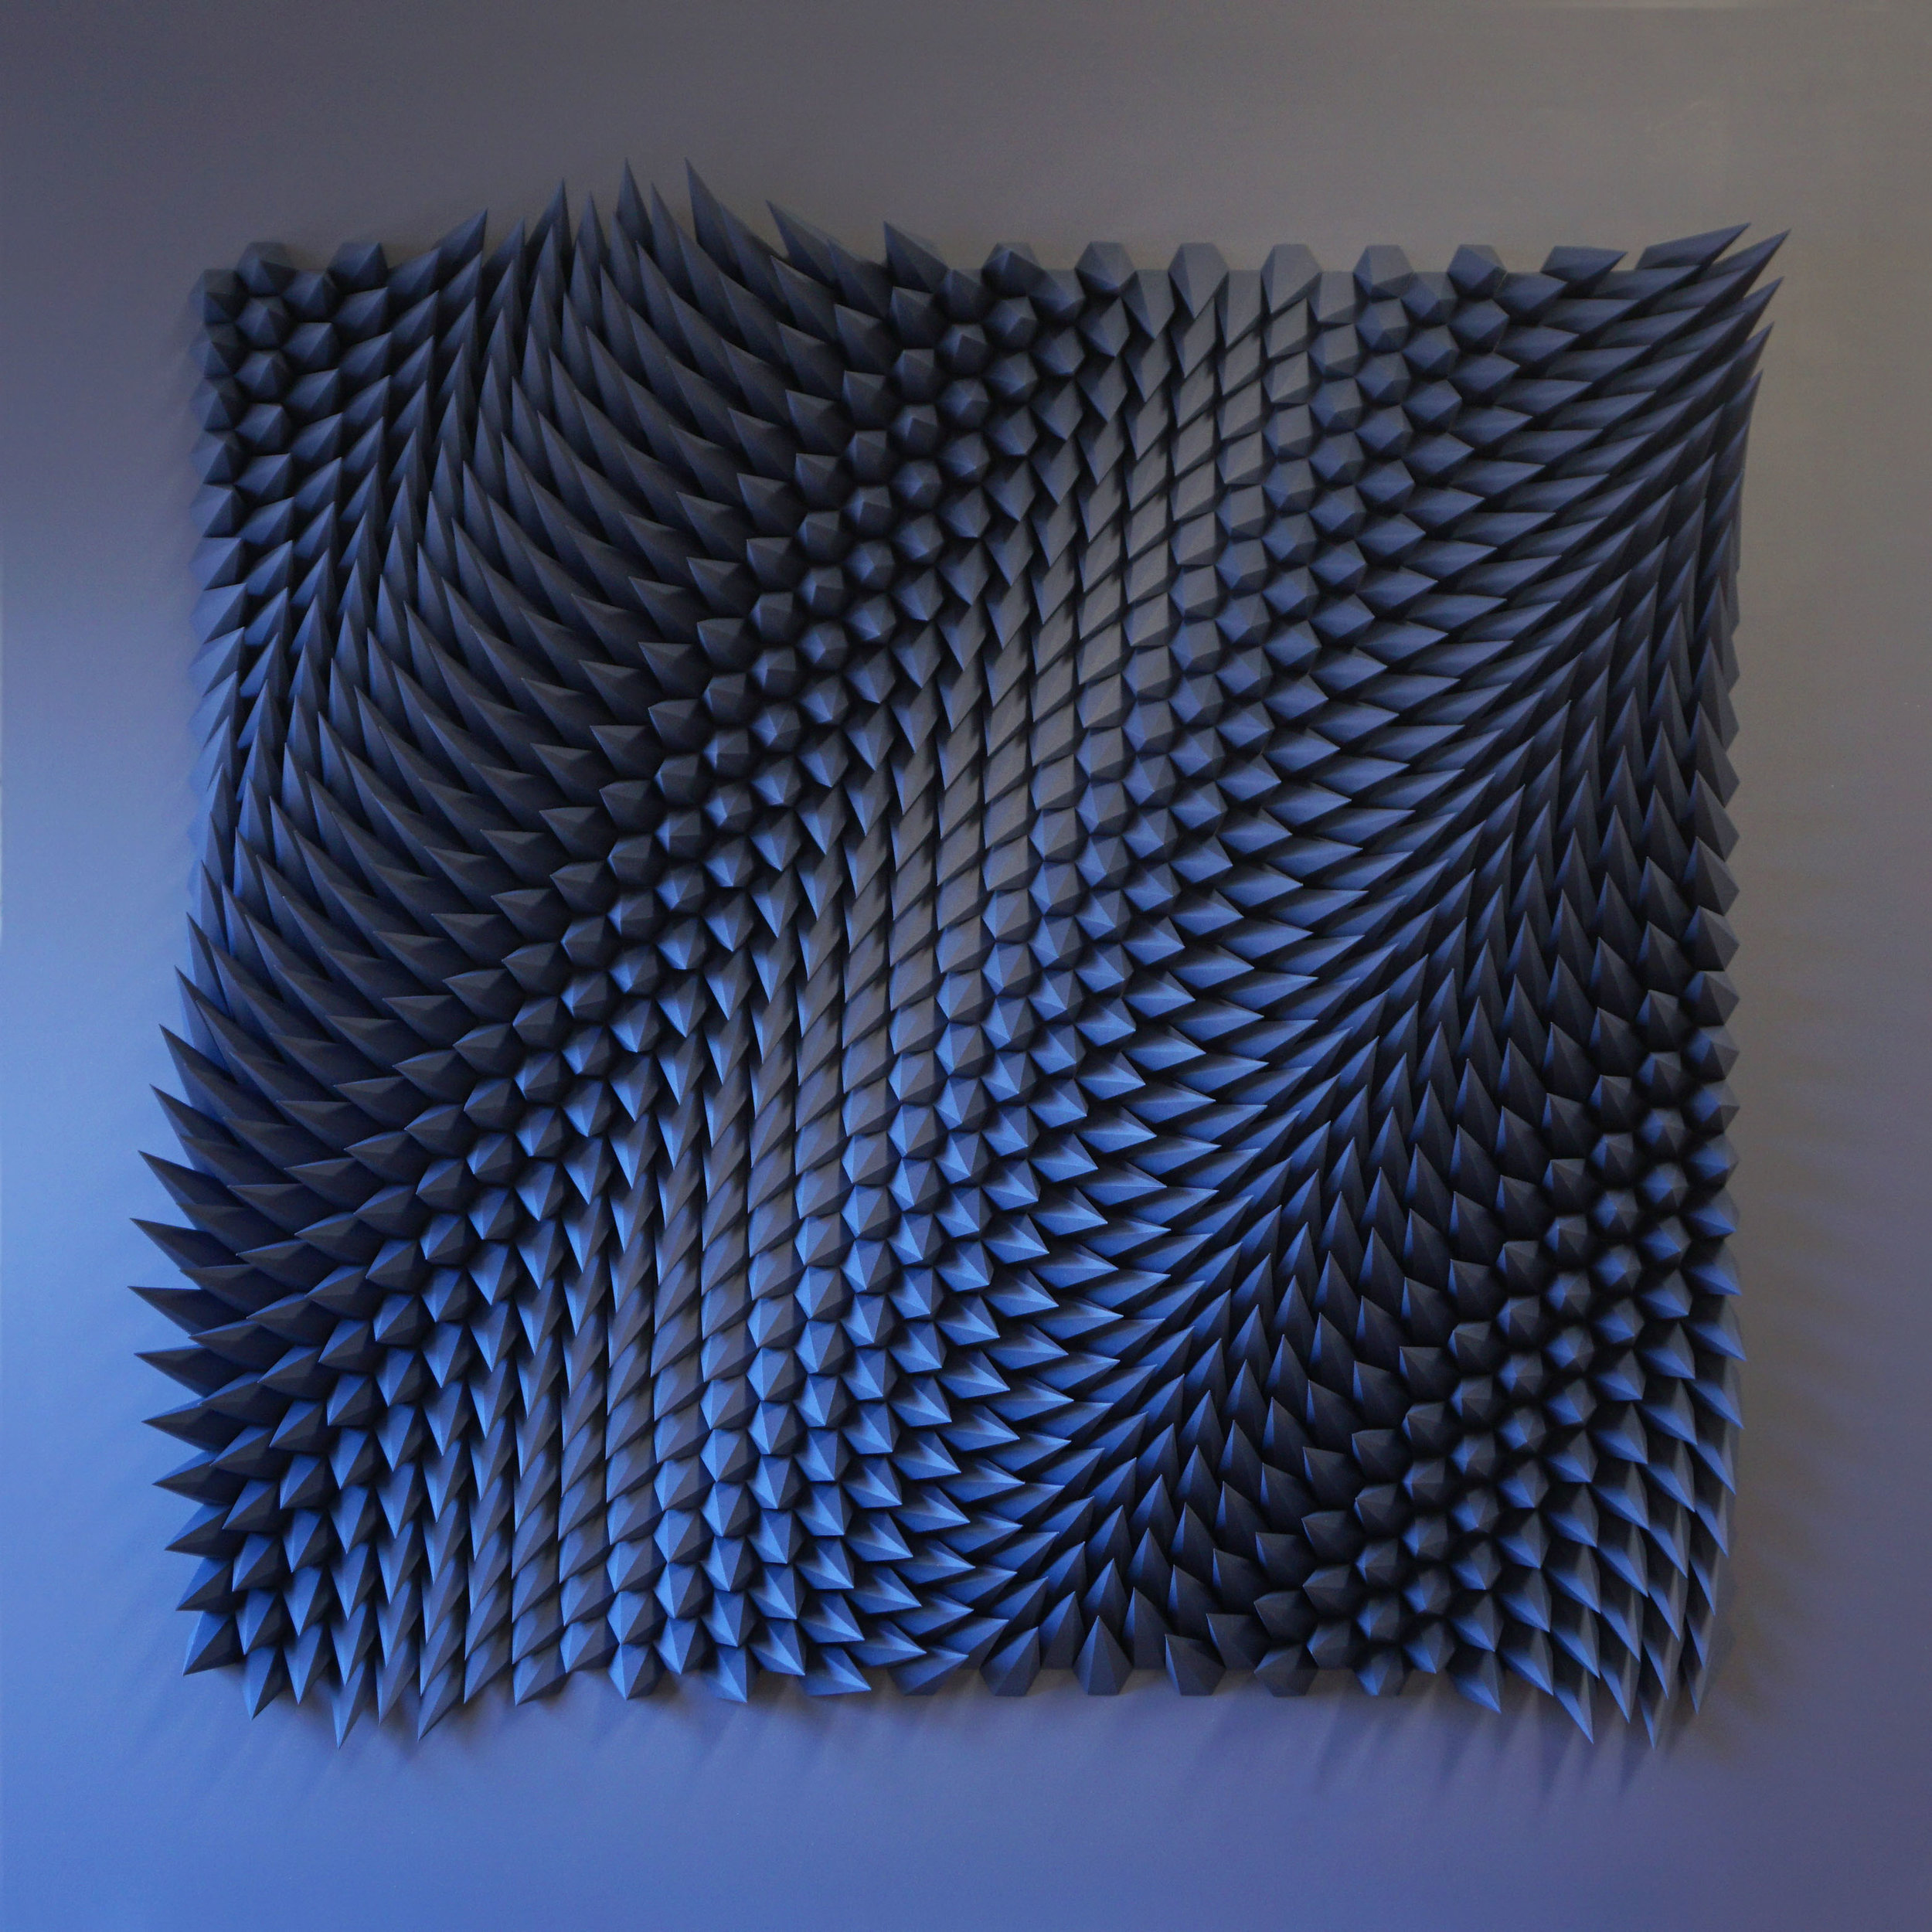 "Stagger (Indigo),  Cut and Folded Indigo Paper, 64""H x 64""W x 5""D"